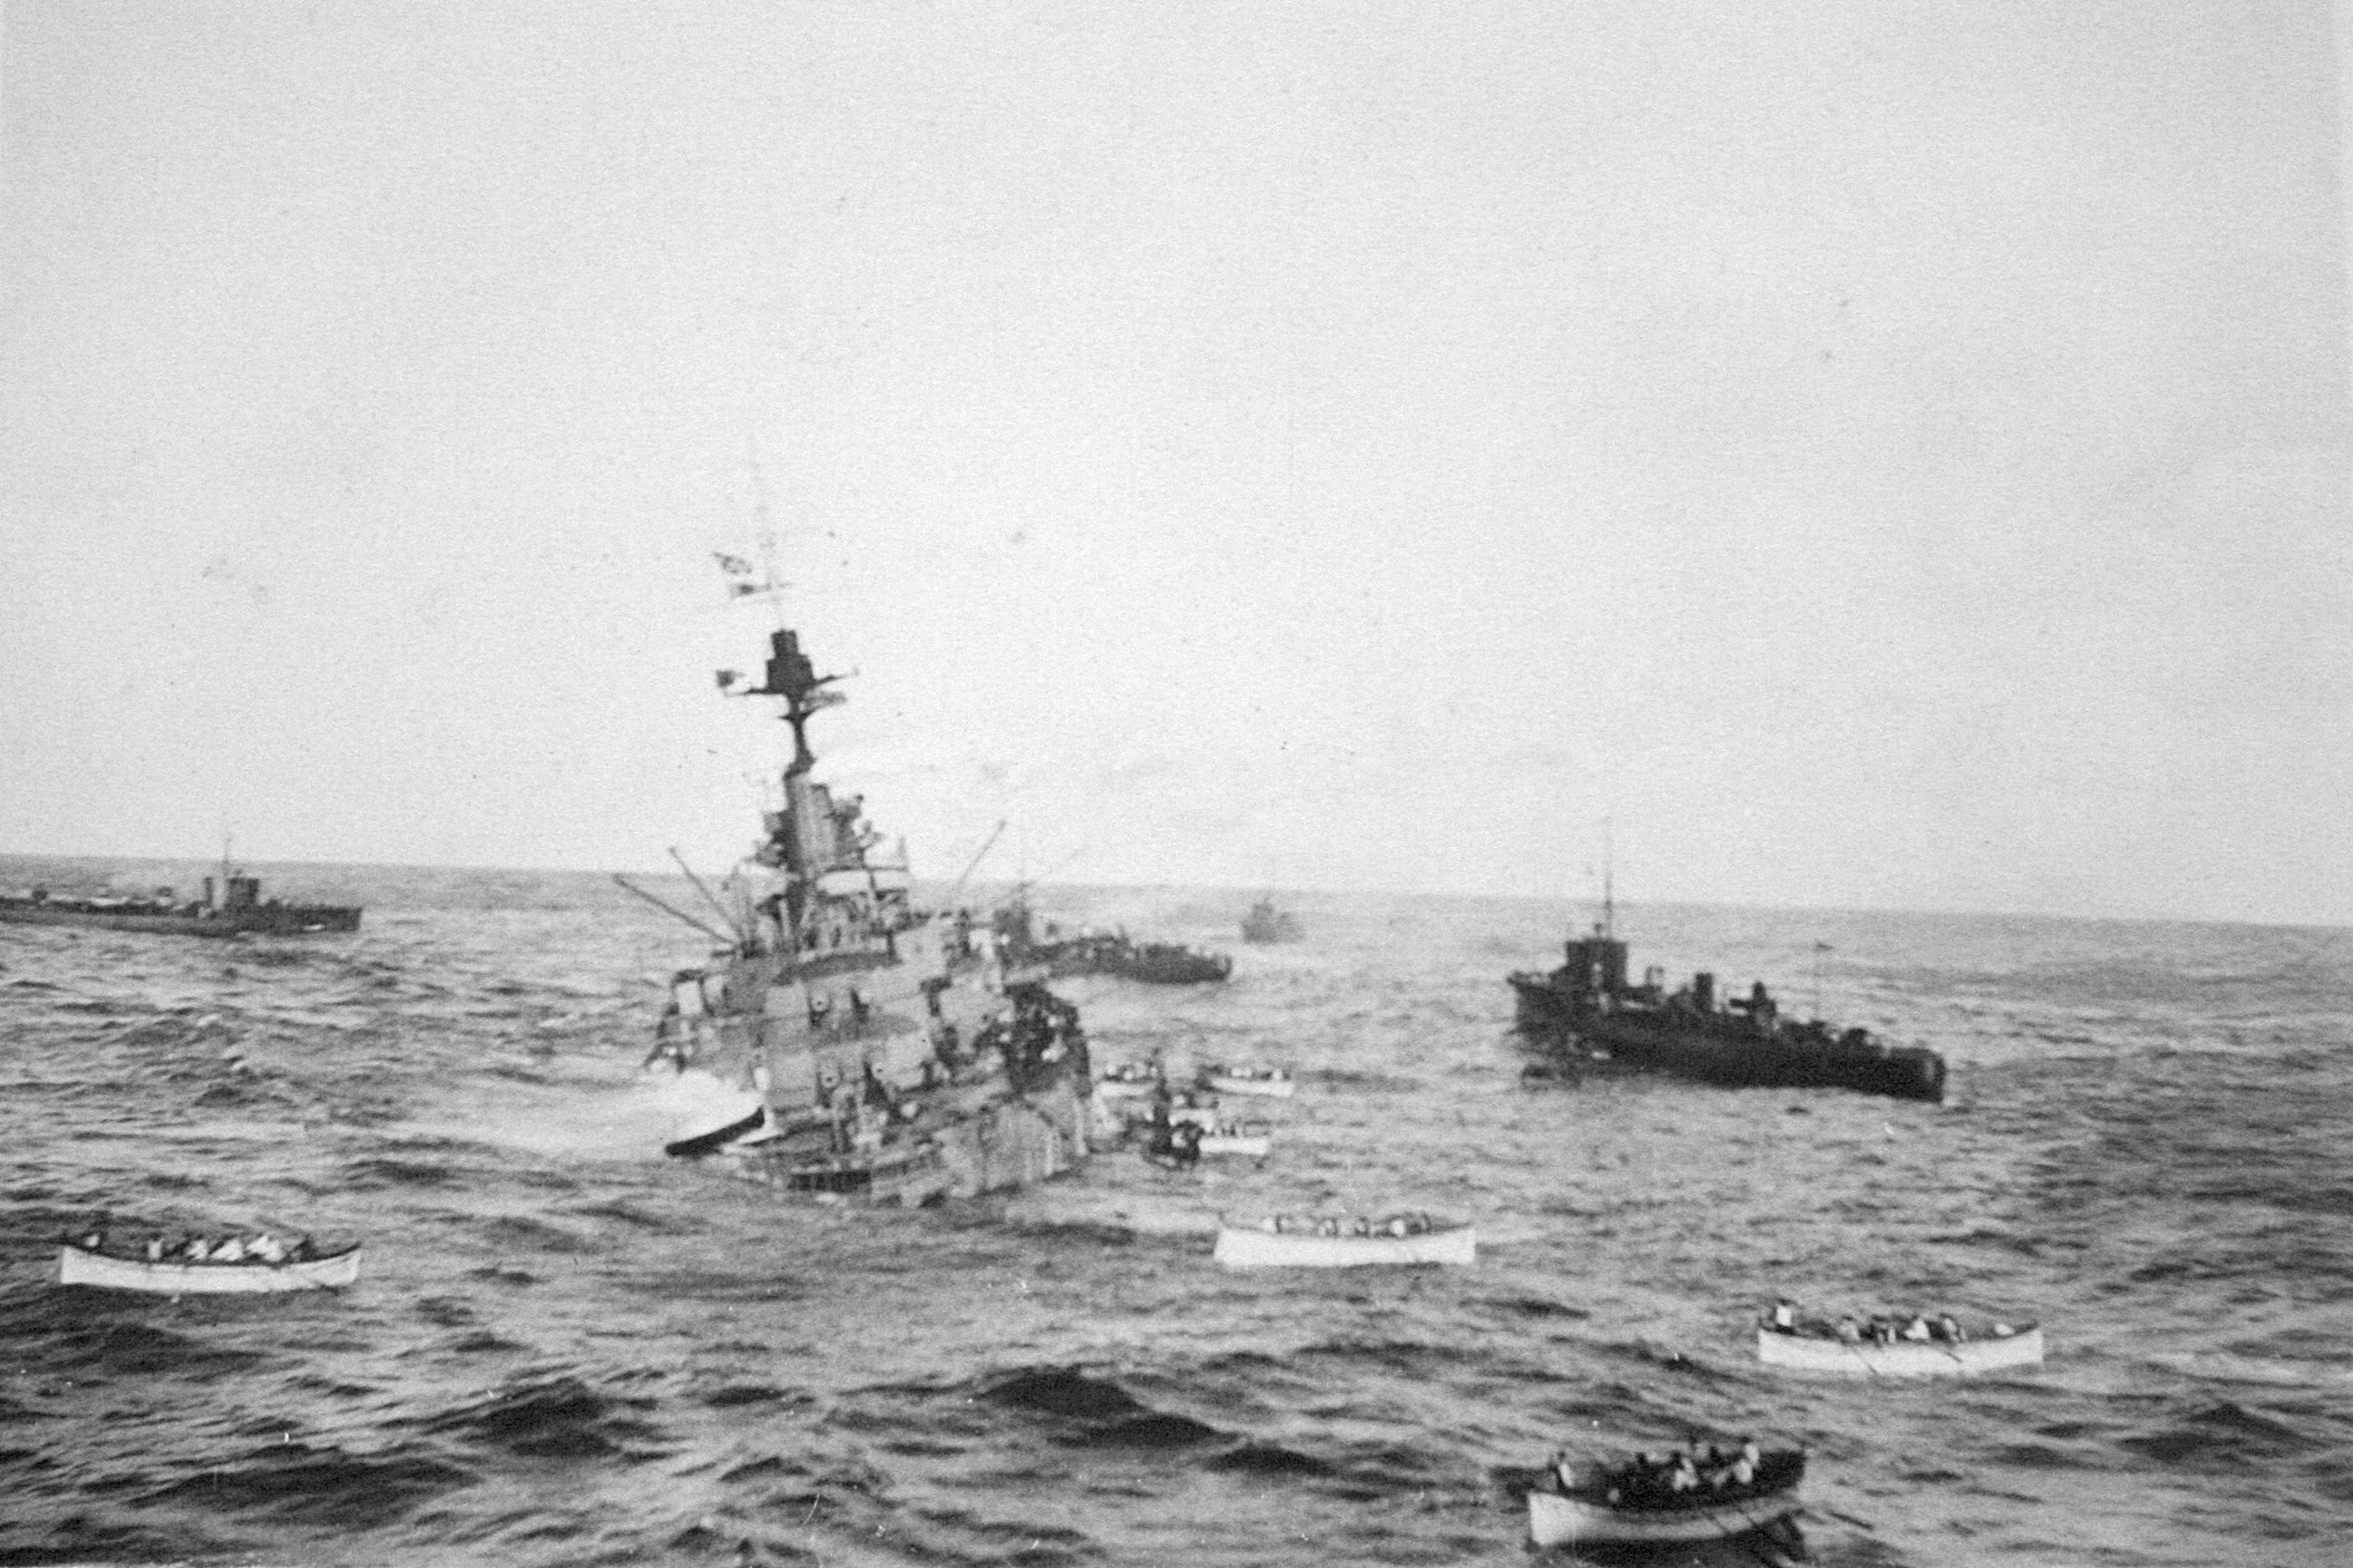 Pourquoi le Britannic a-t-il chaviré ? - Page 2 HMS_Audacious_crew_take_to_lifeboats